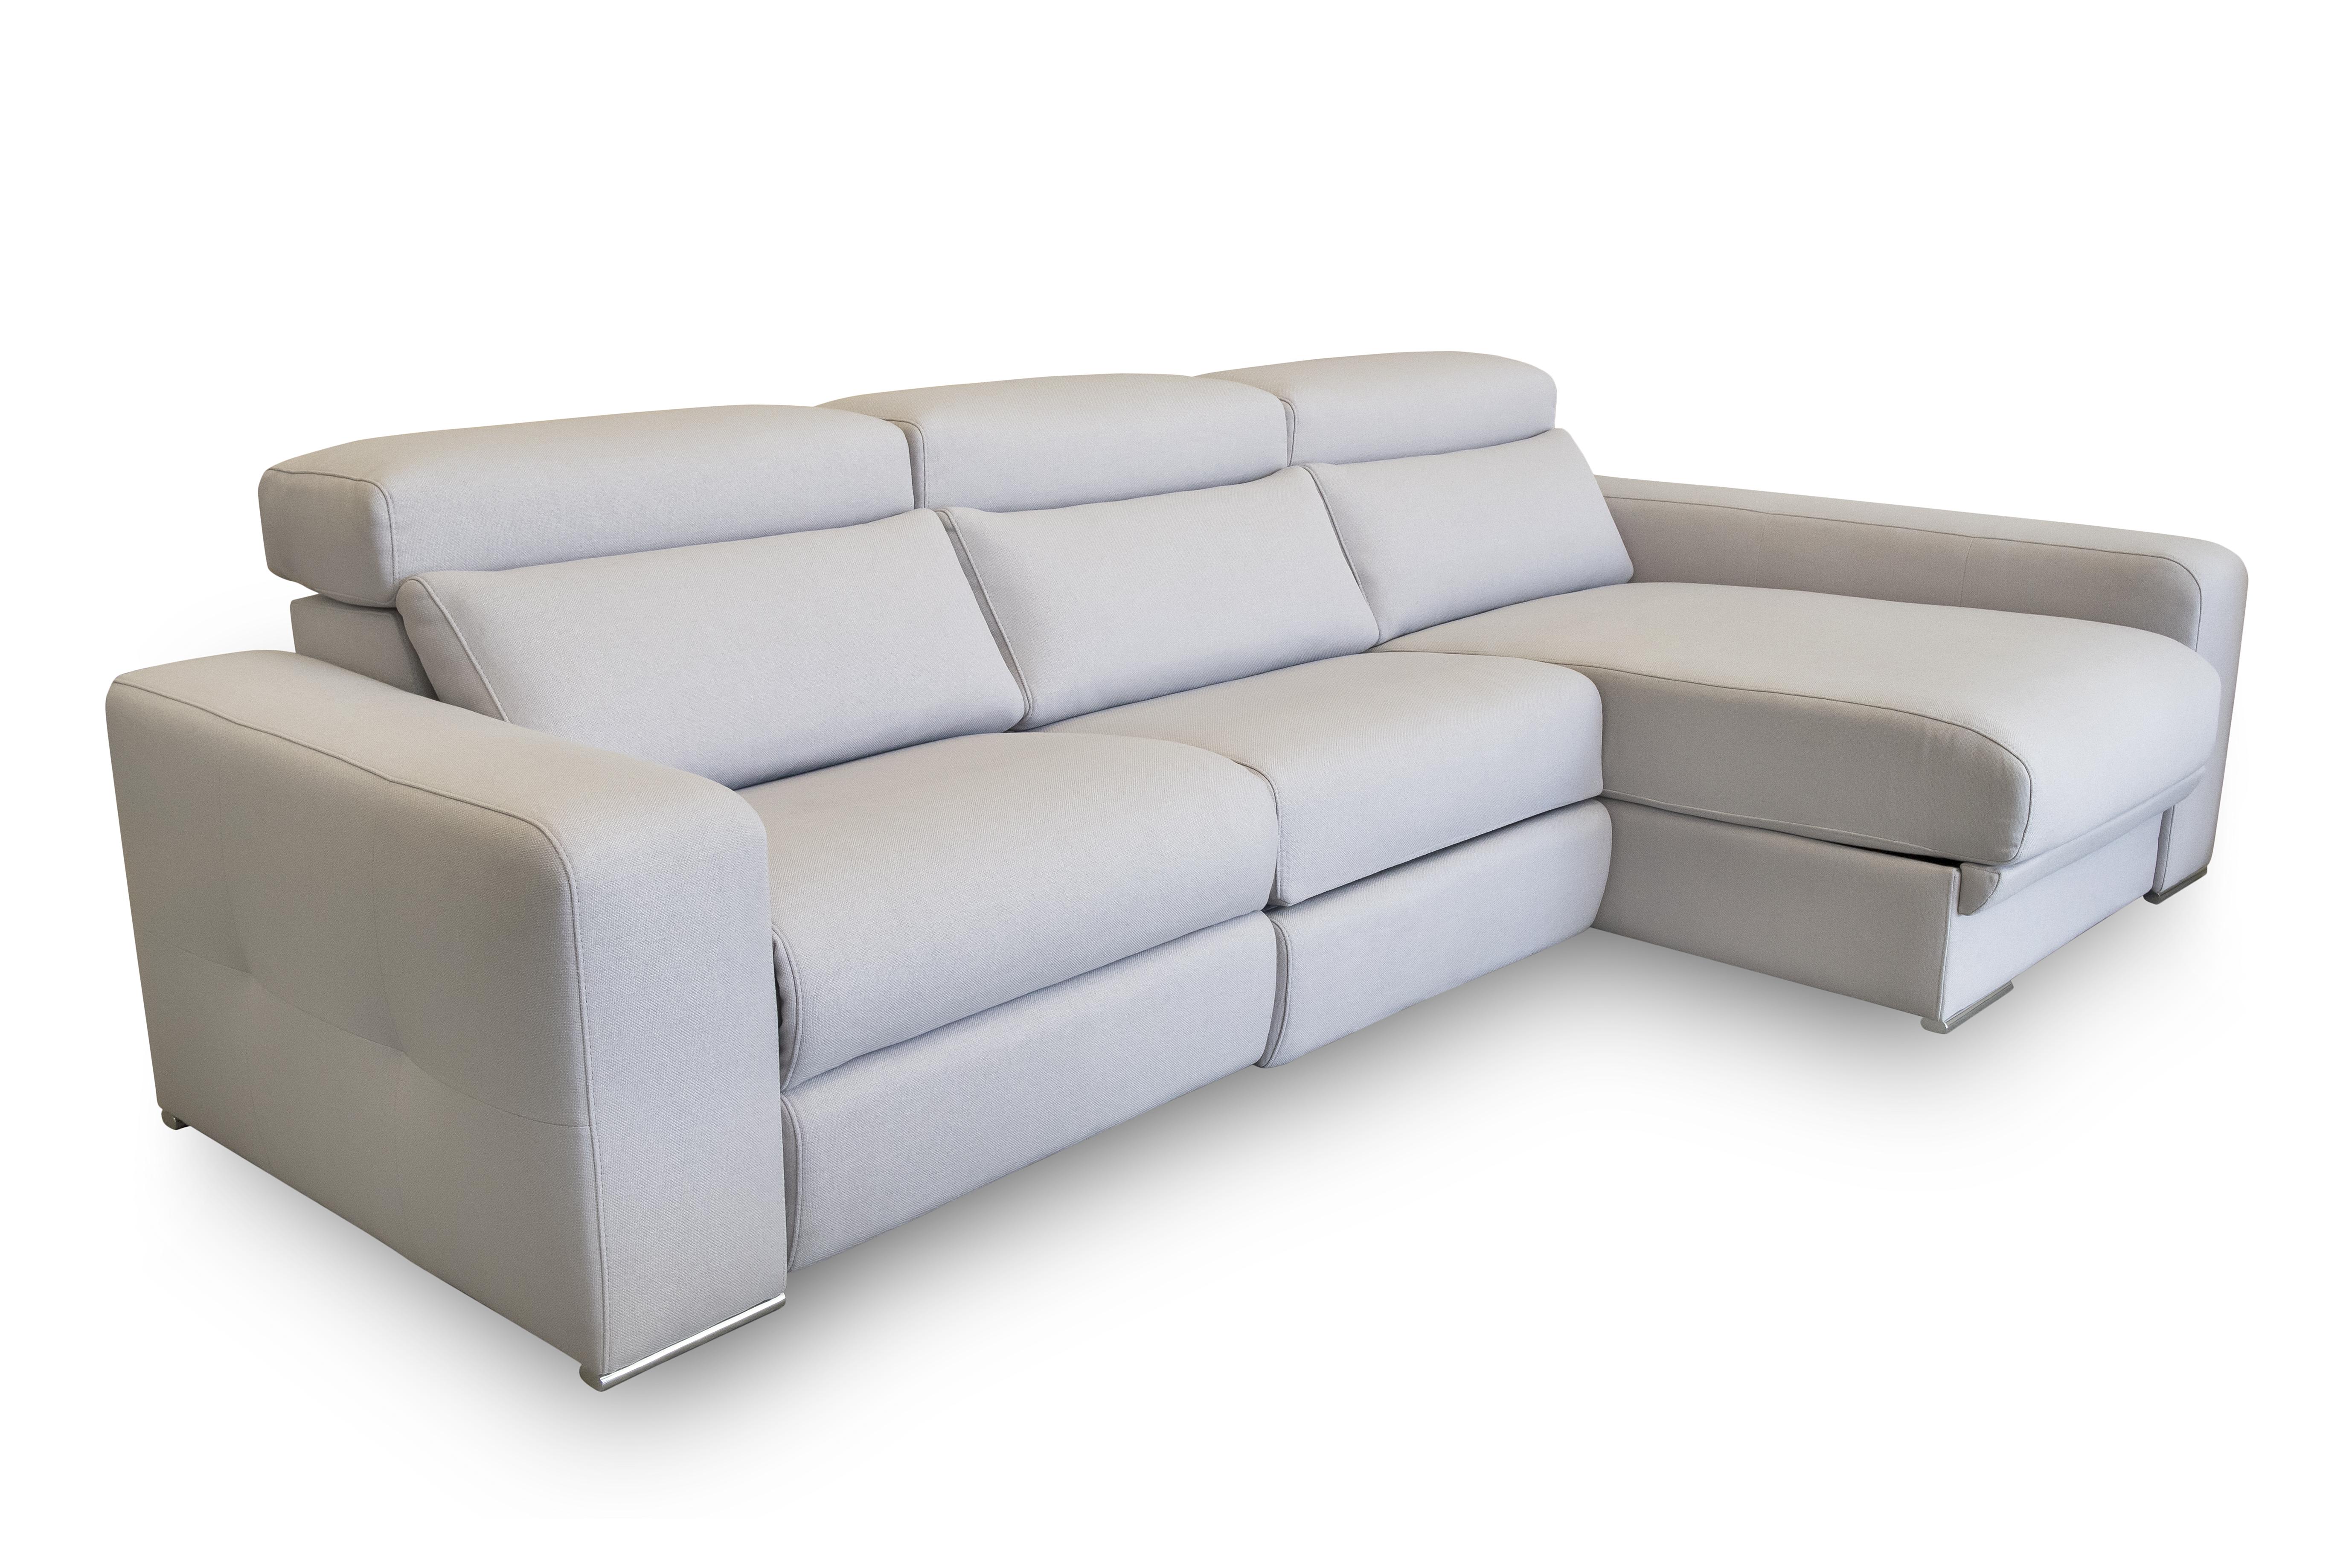 chaise-longue-modelo-nuria-1-300e